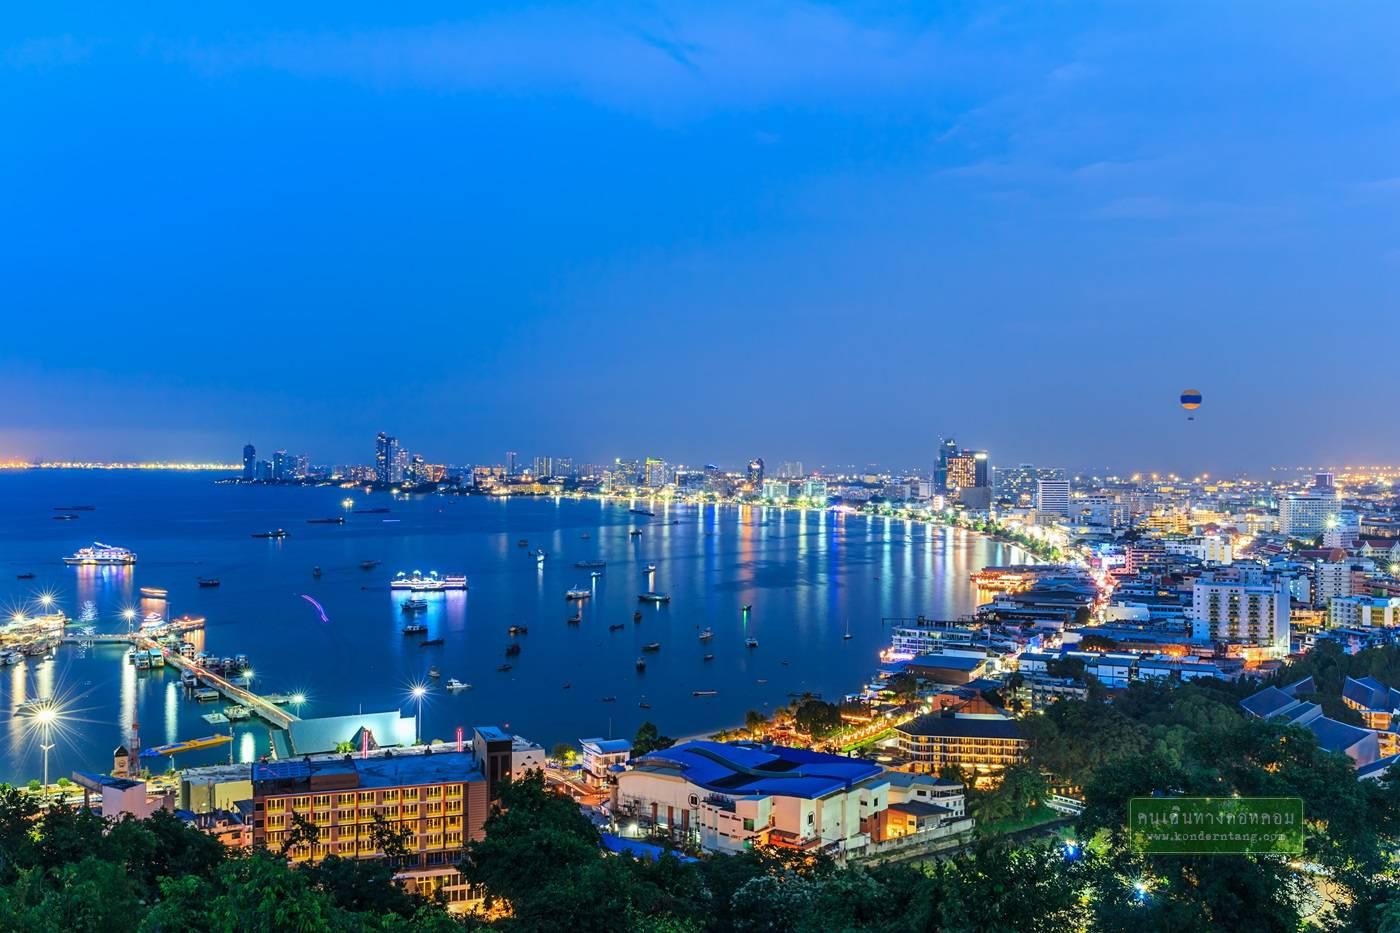 Cityscape of Pattaya at twilight